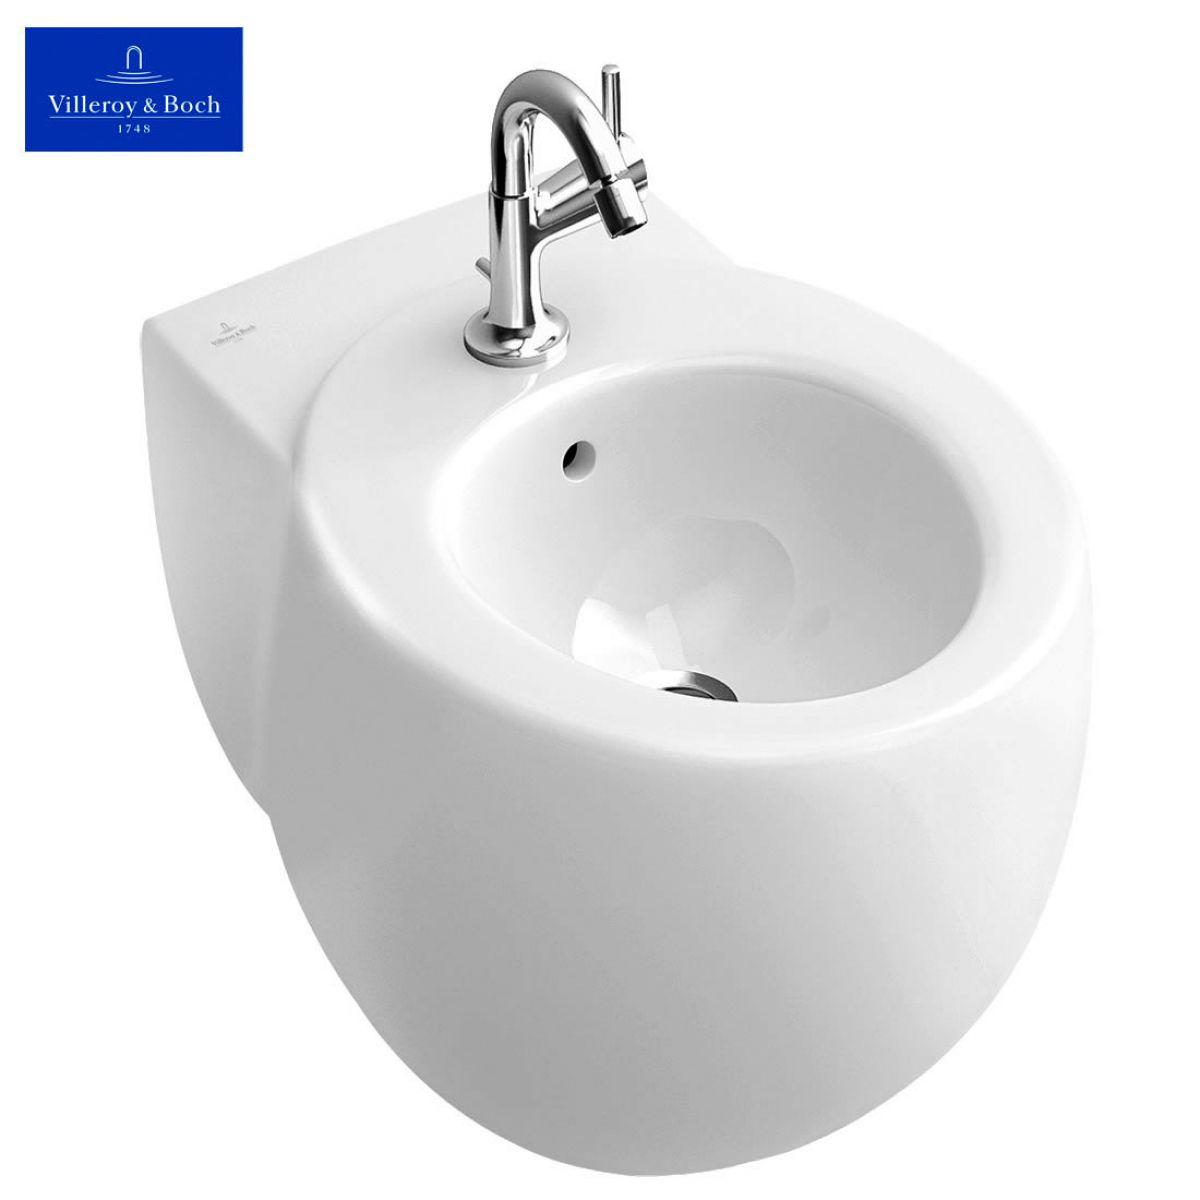 villeroy boch aveo new generation bidet uk bathrooms. Black Bedroom Furniture Sets. Home Design Ideas